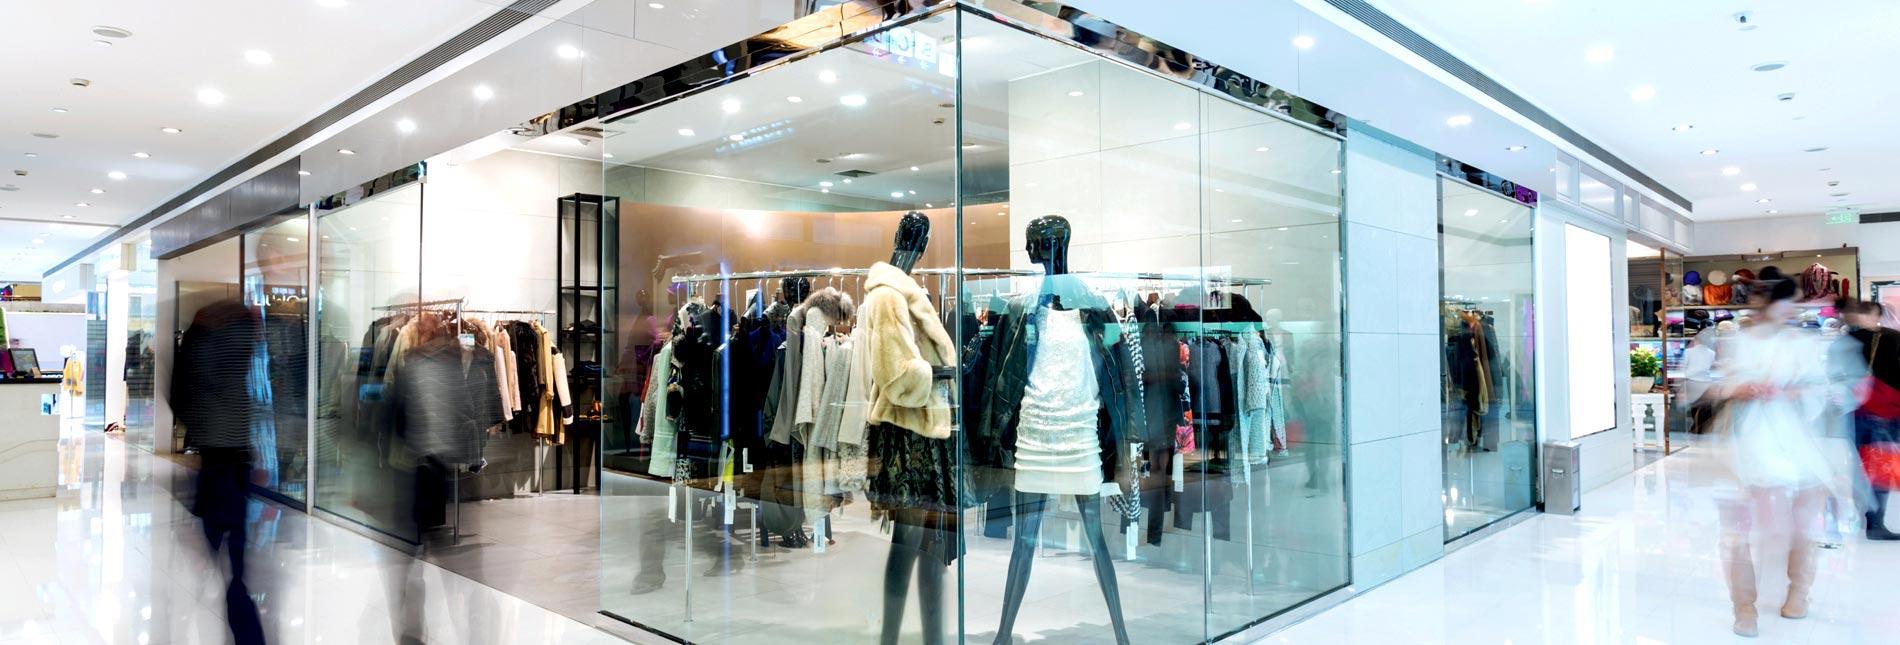 MBA in Sales & Retail Marketing - Chitkara University